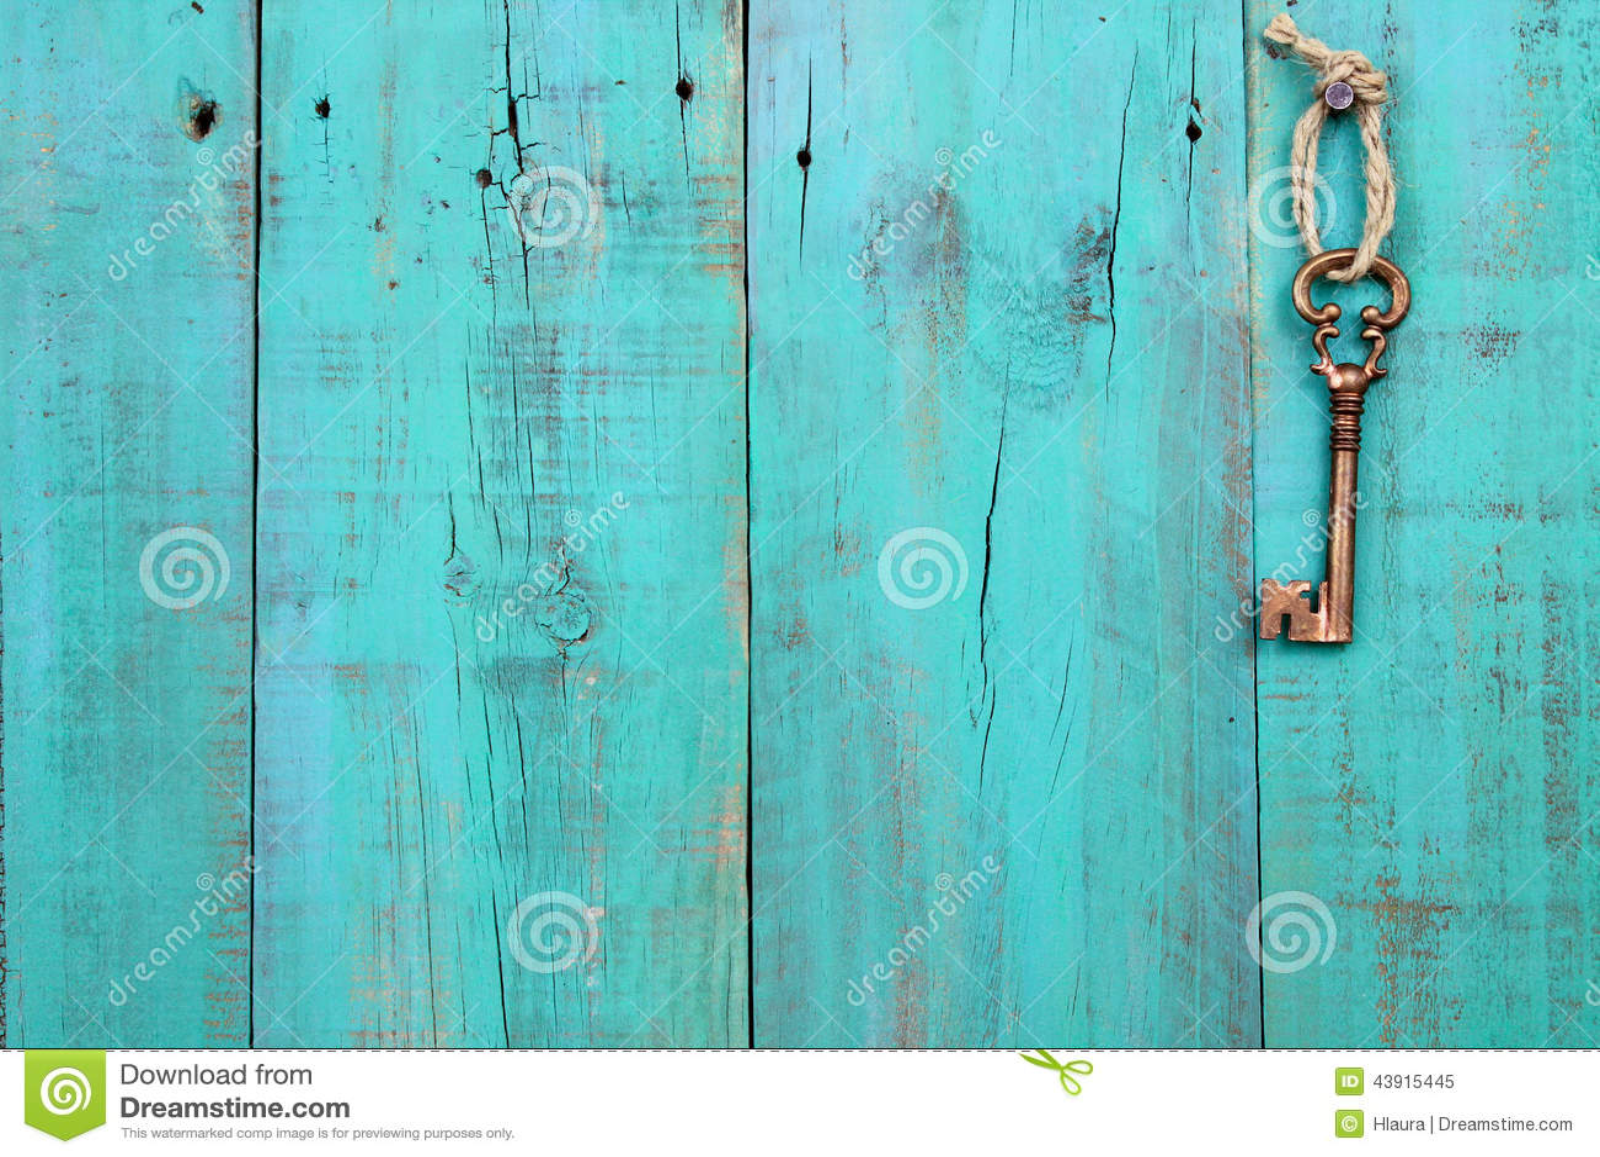 Bronze skeleton key hanging on vintage teal blue wood door